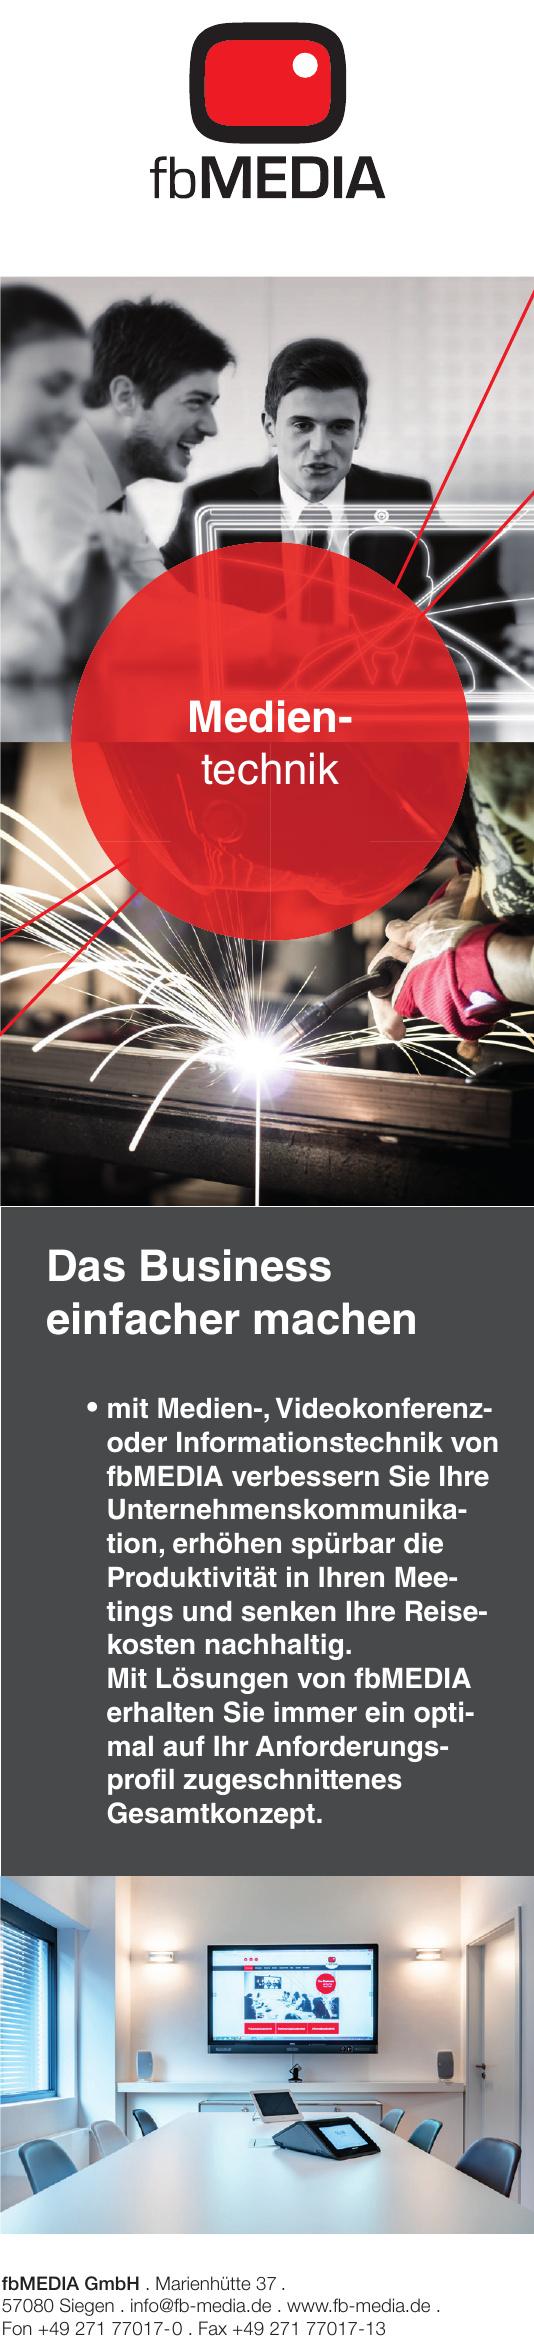 fbMEDIA GmbH